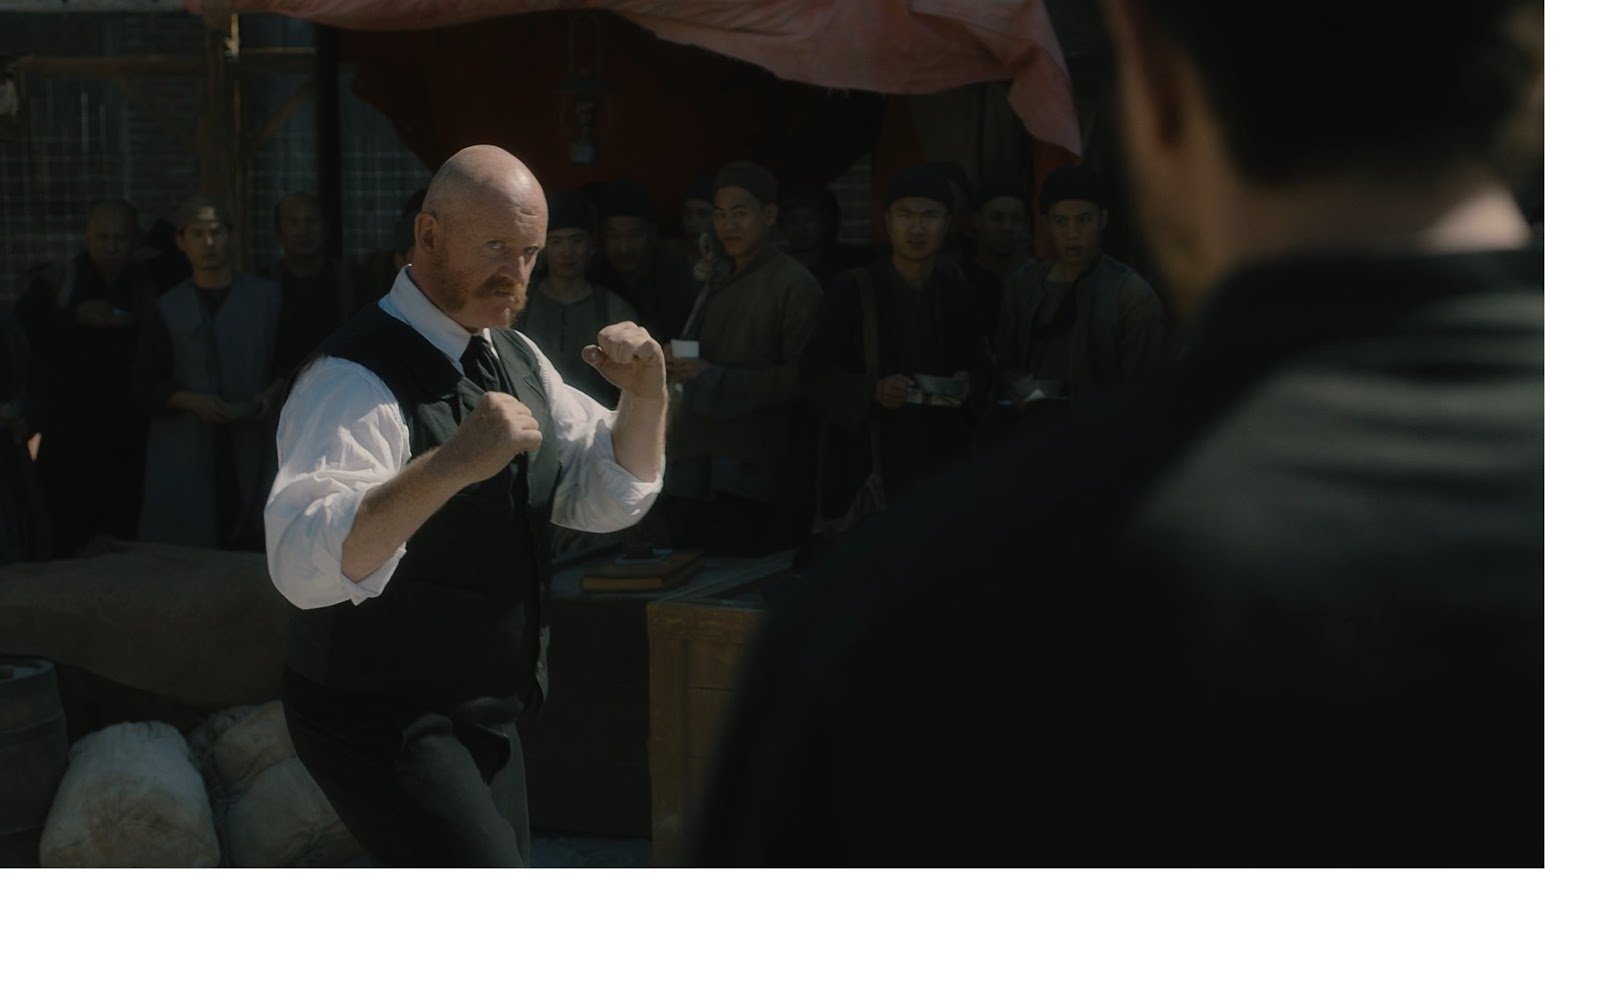 Guerrero|Bruce Lee|Dual|T1x09|1080 Pesado ligero Zippy